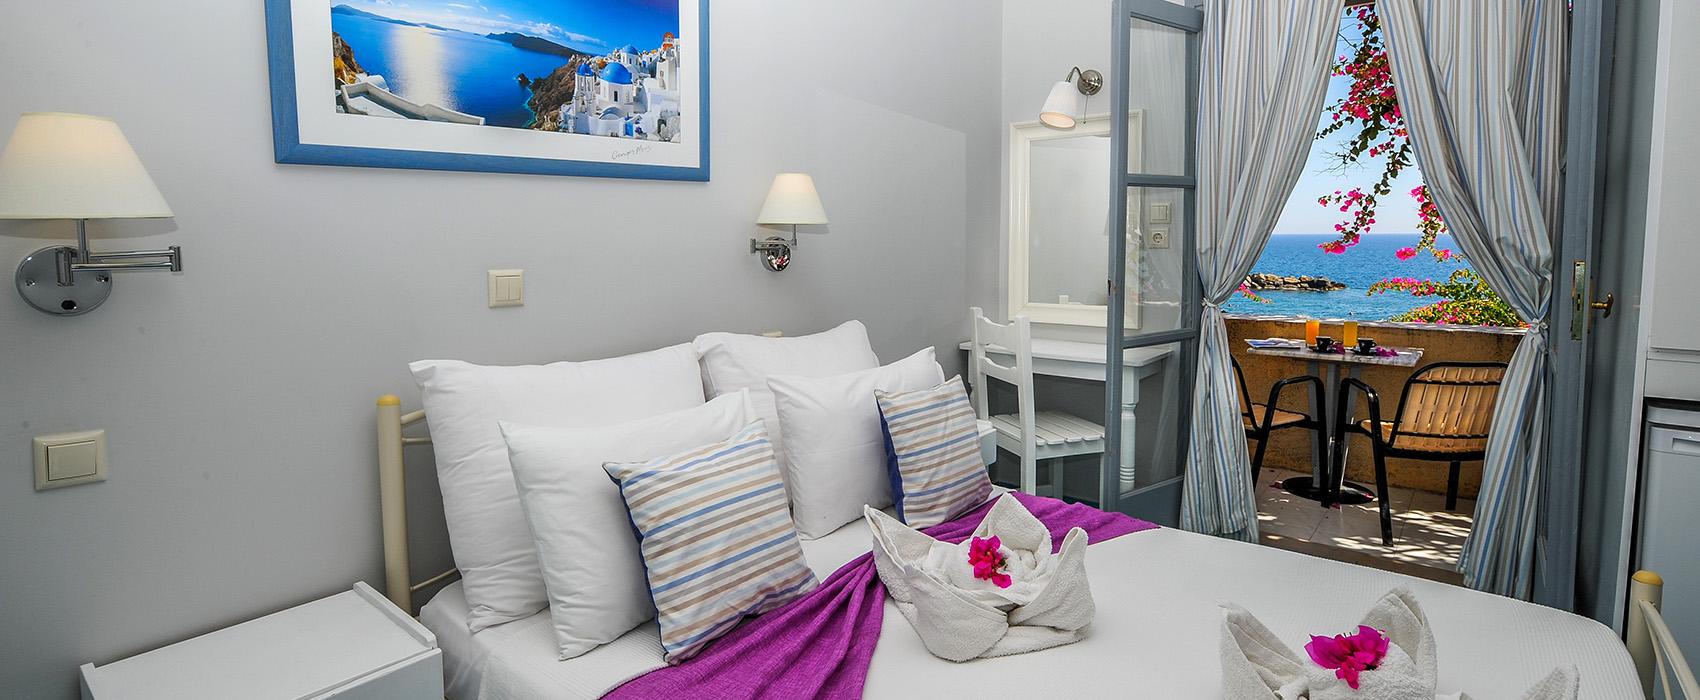 Nostos Hotel Kamari Santorini